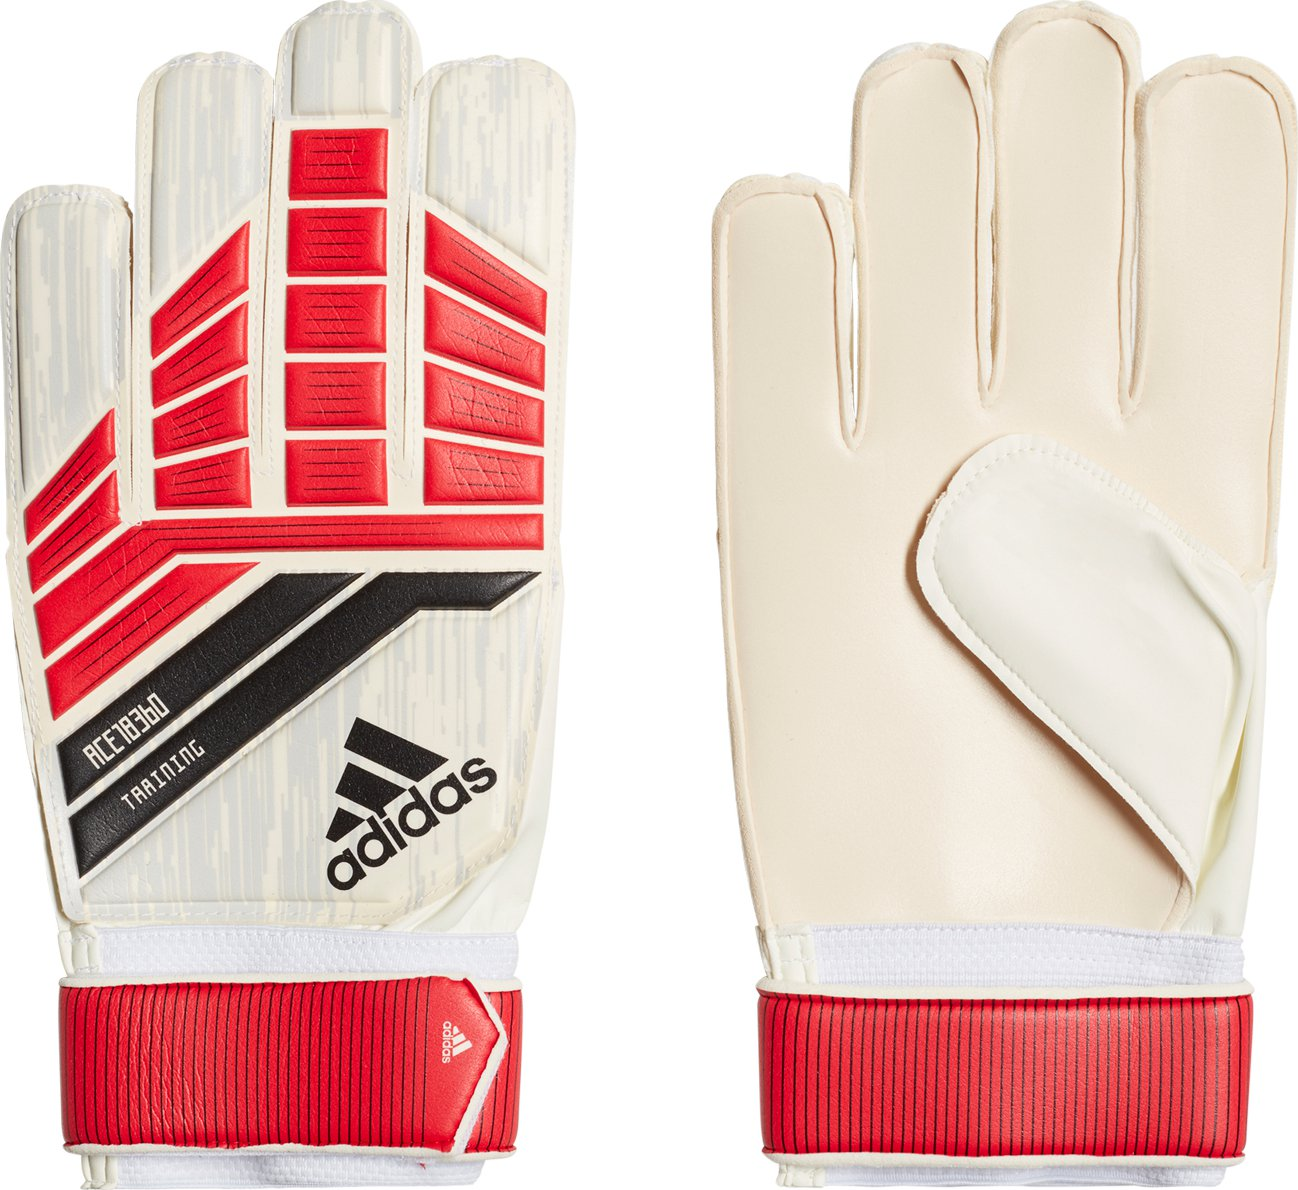 Adidas Predator Training bílé červené černé od 339 Kč • Zboží.cz 56a278a21f